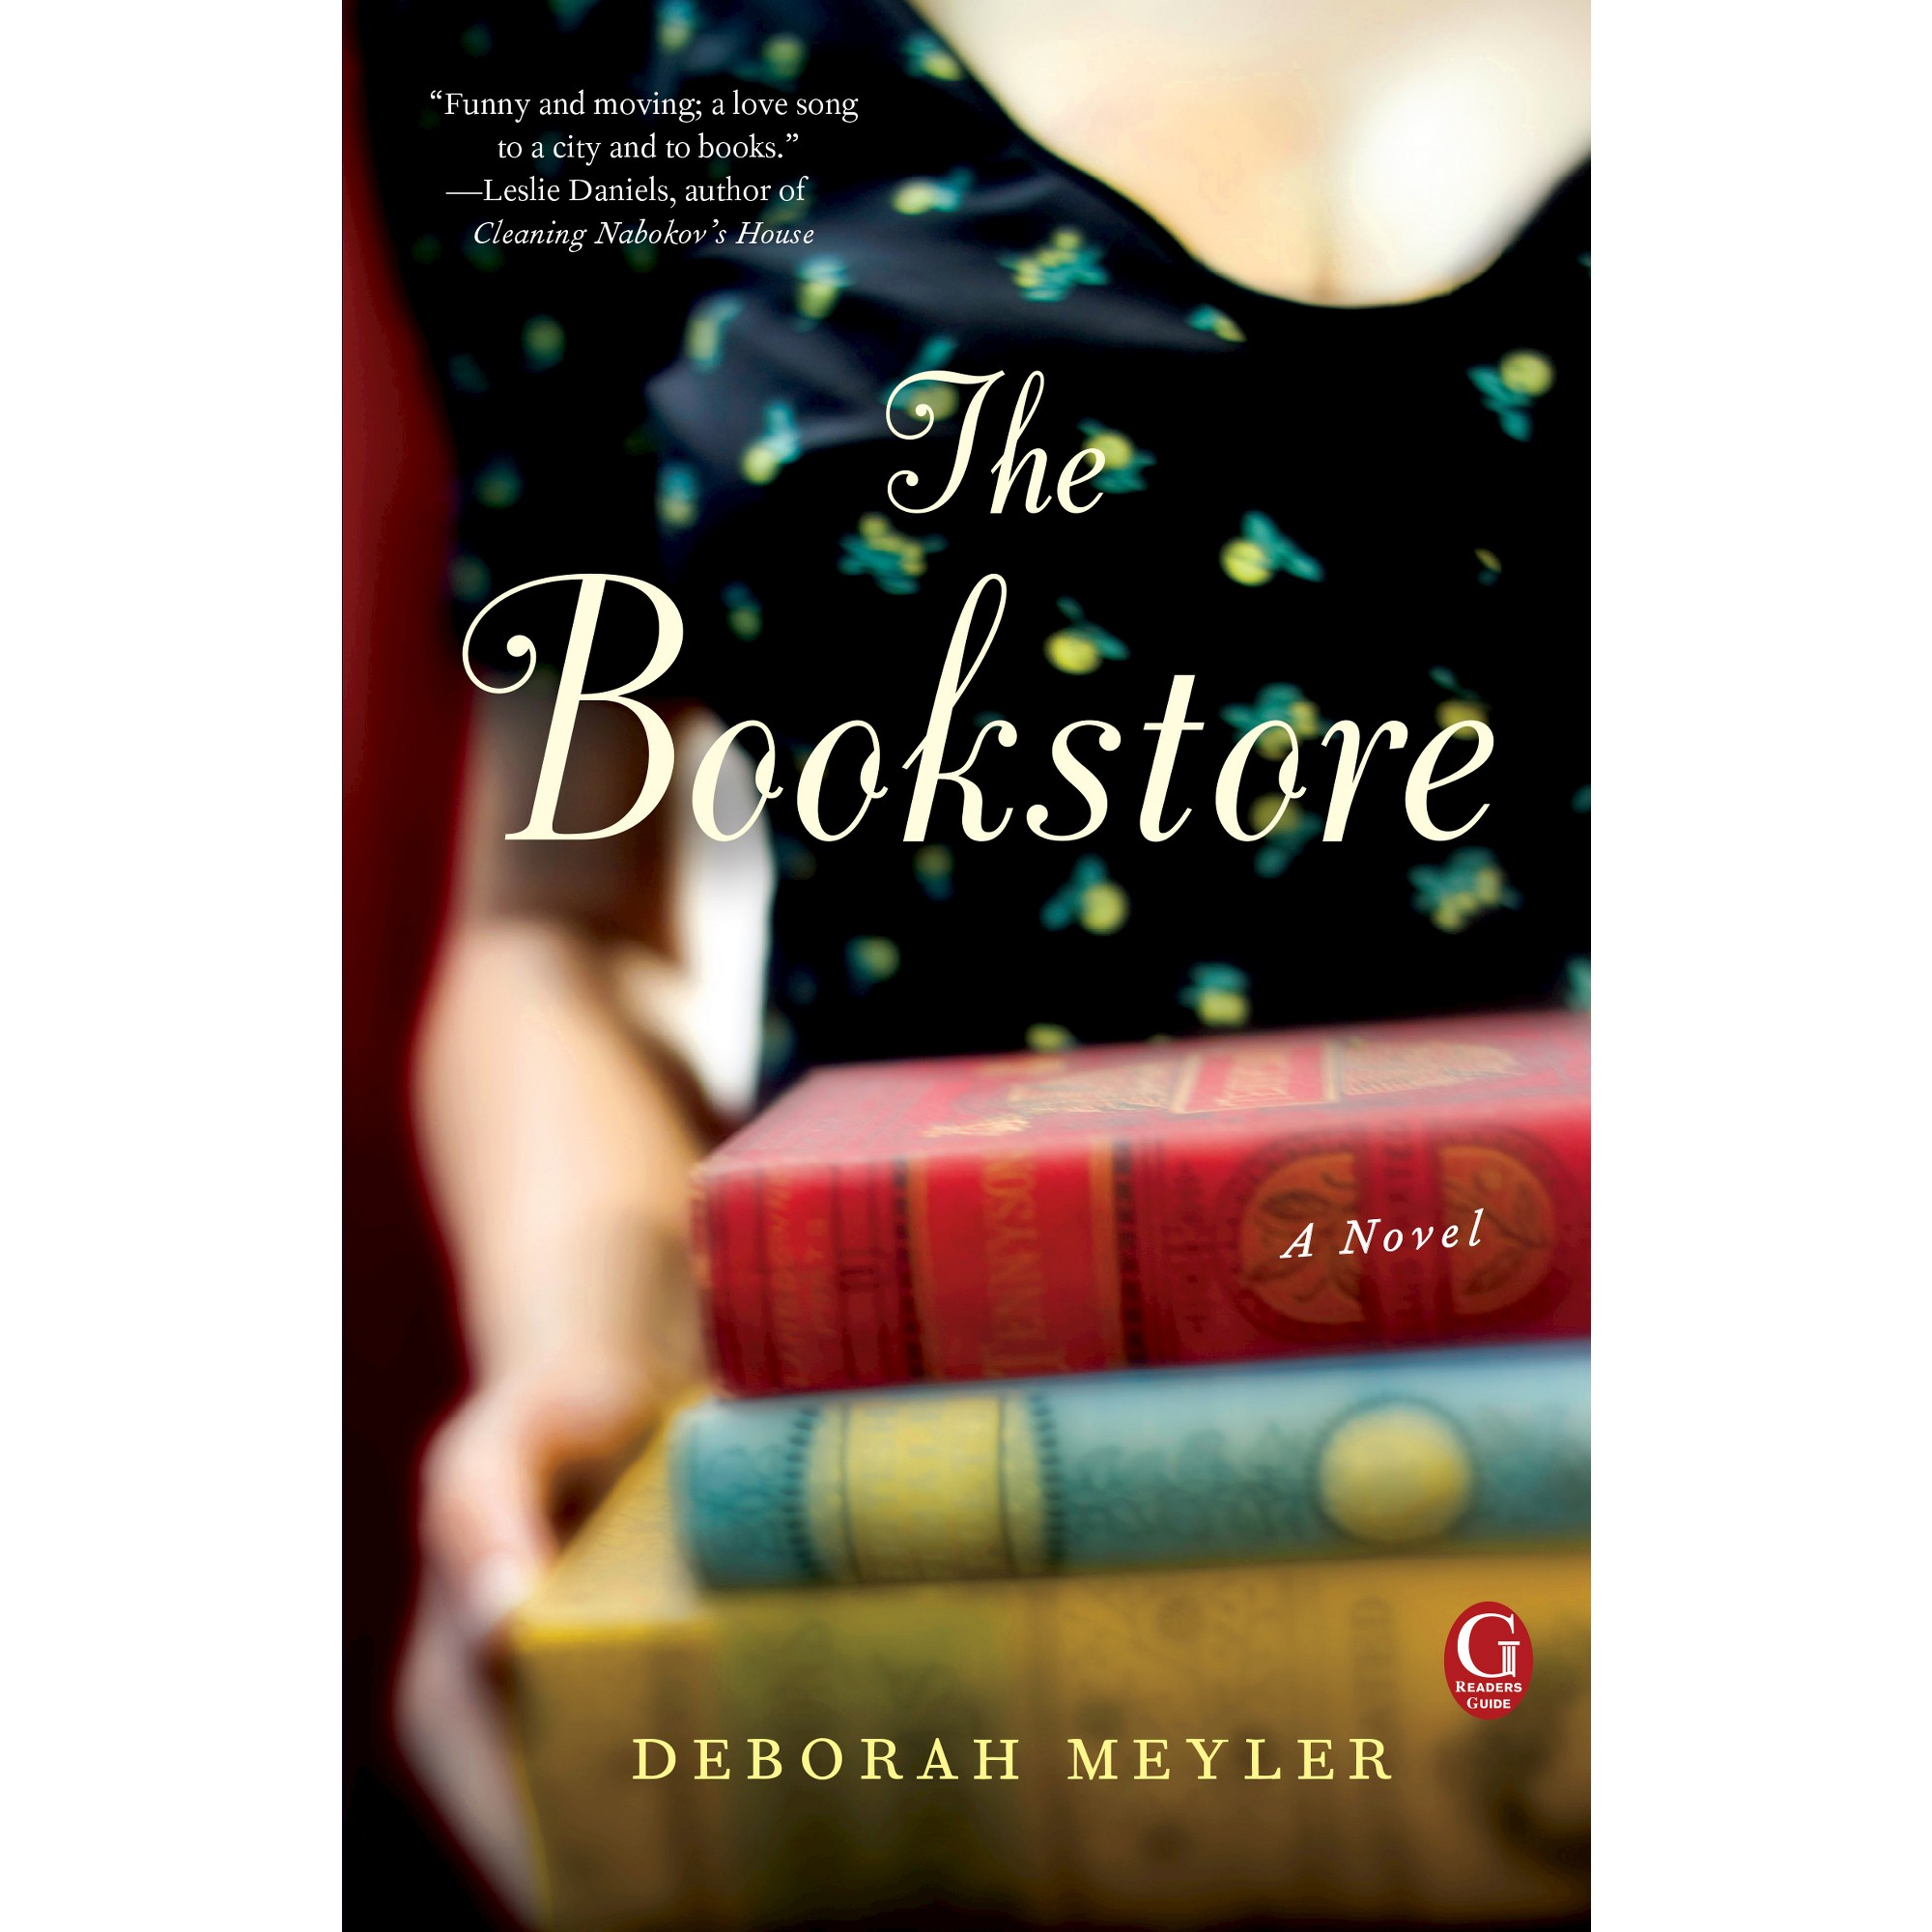 The Bookstore (Paperback) by Deborah Meyler | Book worms, Love songs,  Strand bookstore